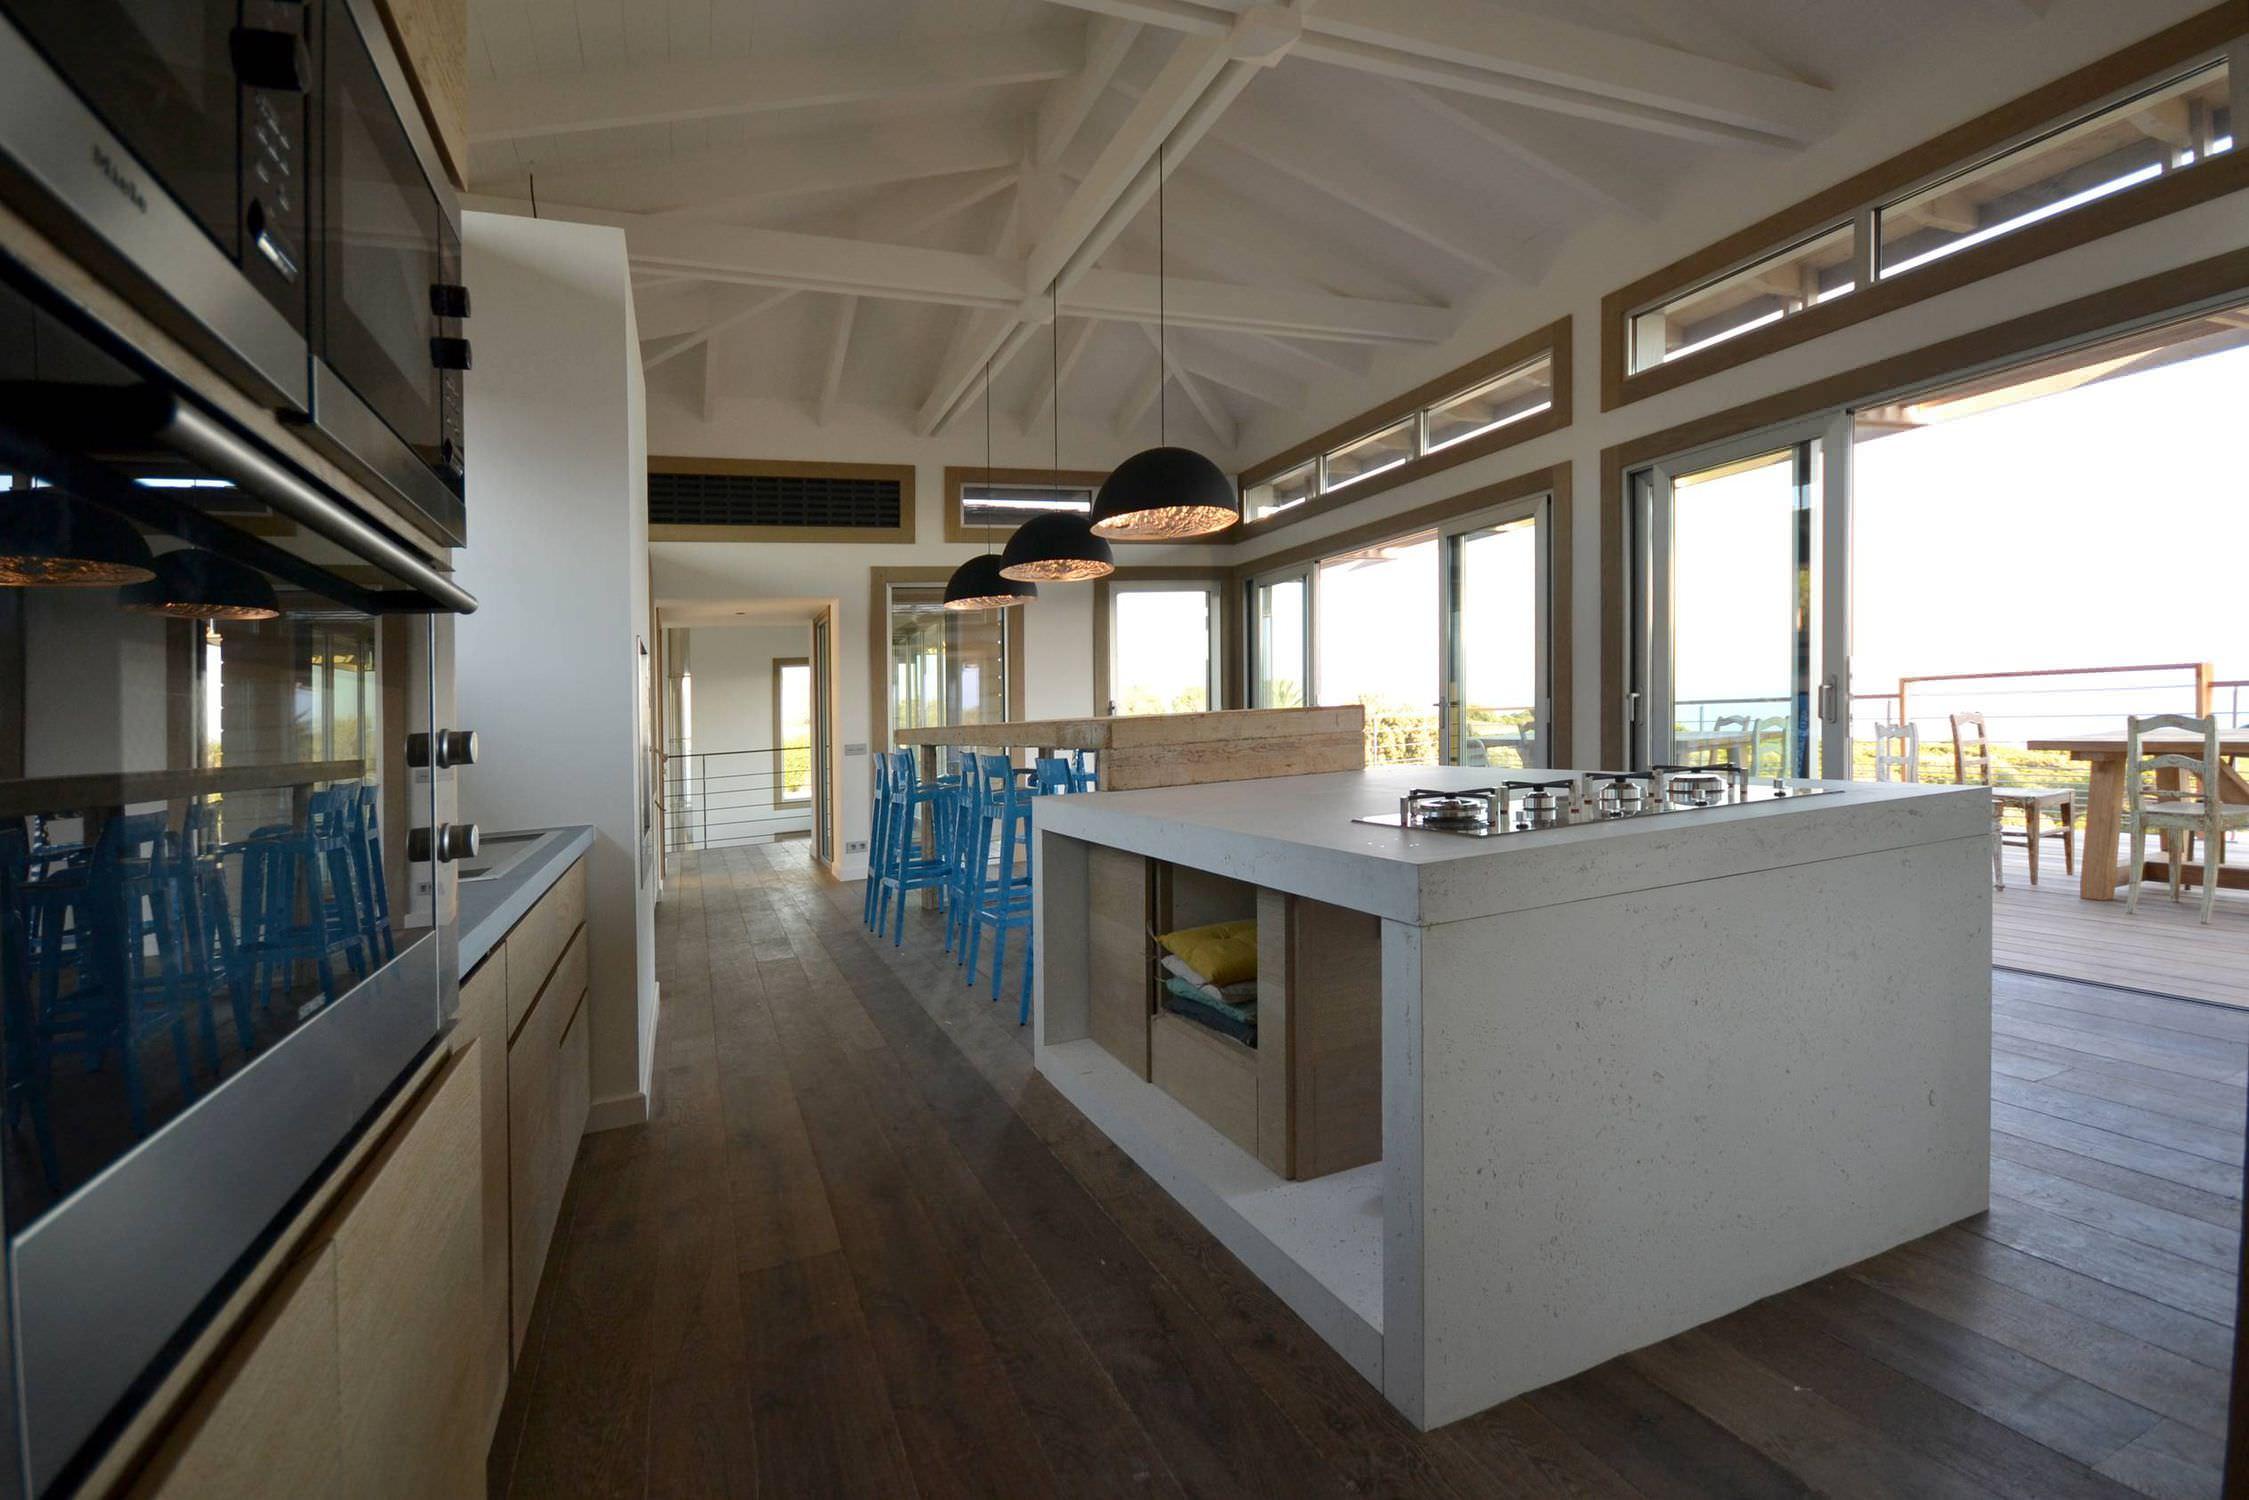 Interesting Concrete Countertop Kitchen Ilt Central En Bton Alleg Concrete  By Lcda With Cuisine En Bton Cir